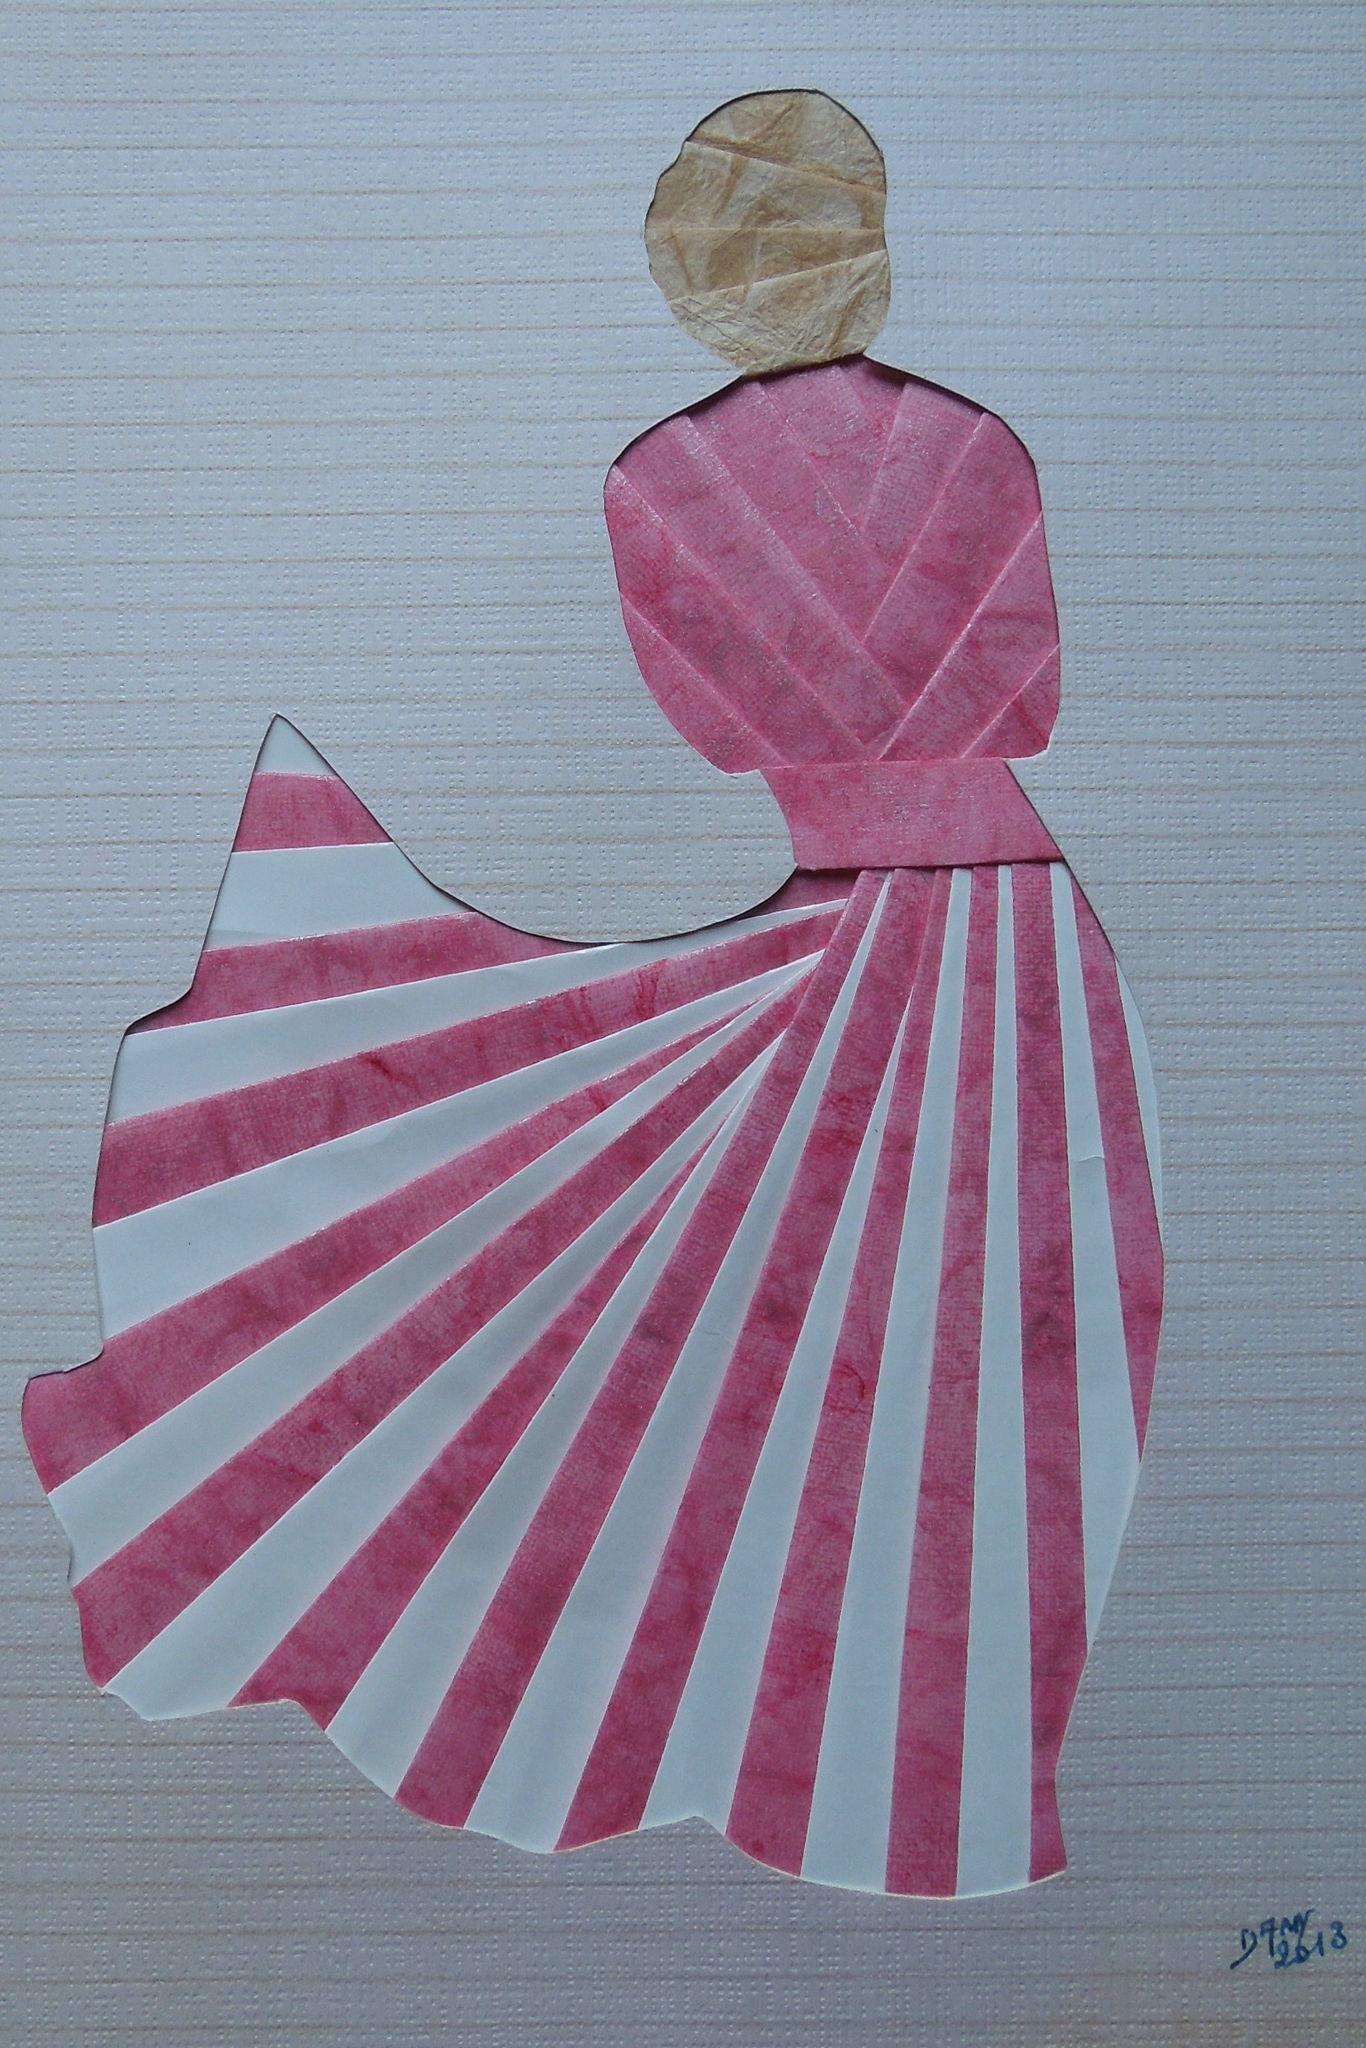 iris folding 0160